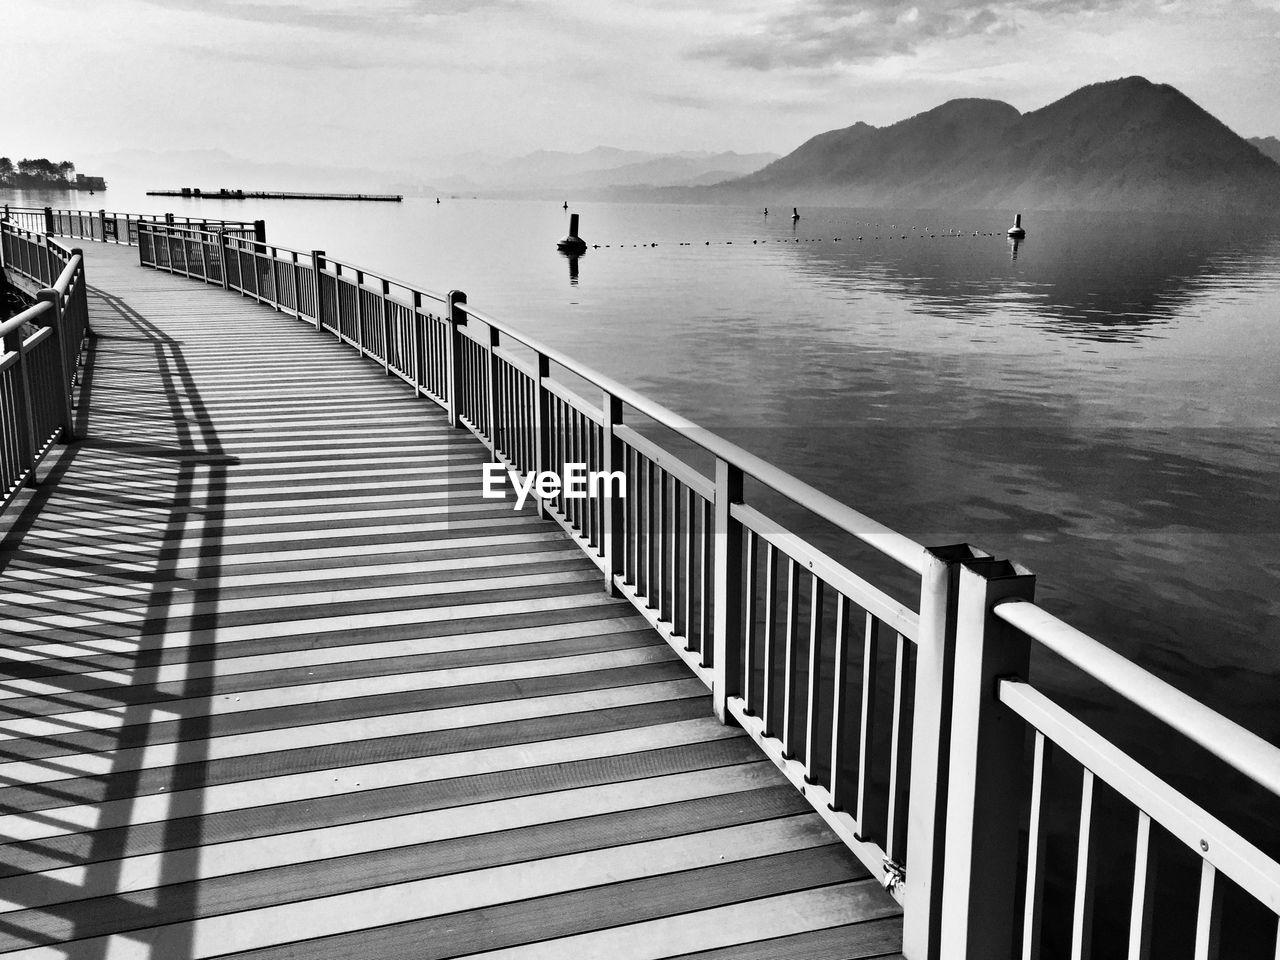 Boardwalk By River Against Sky